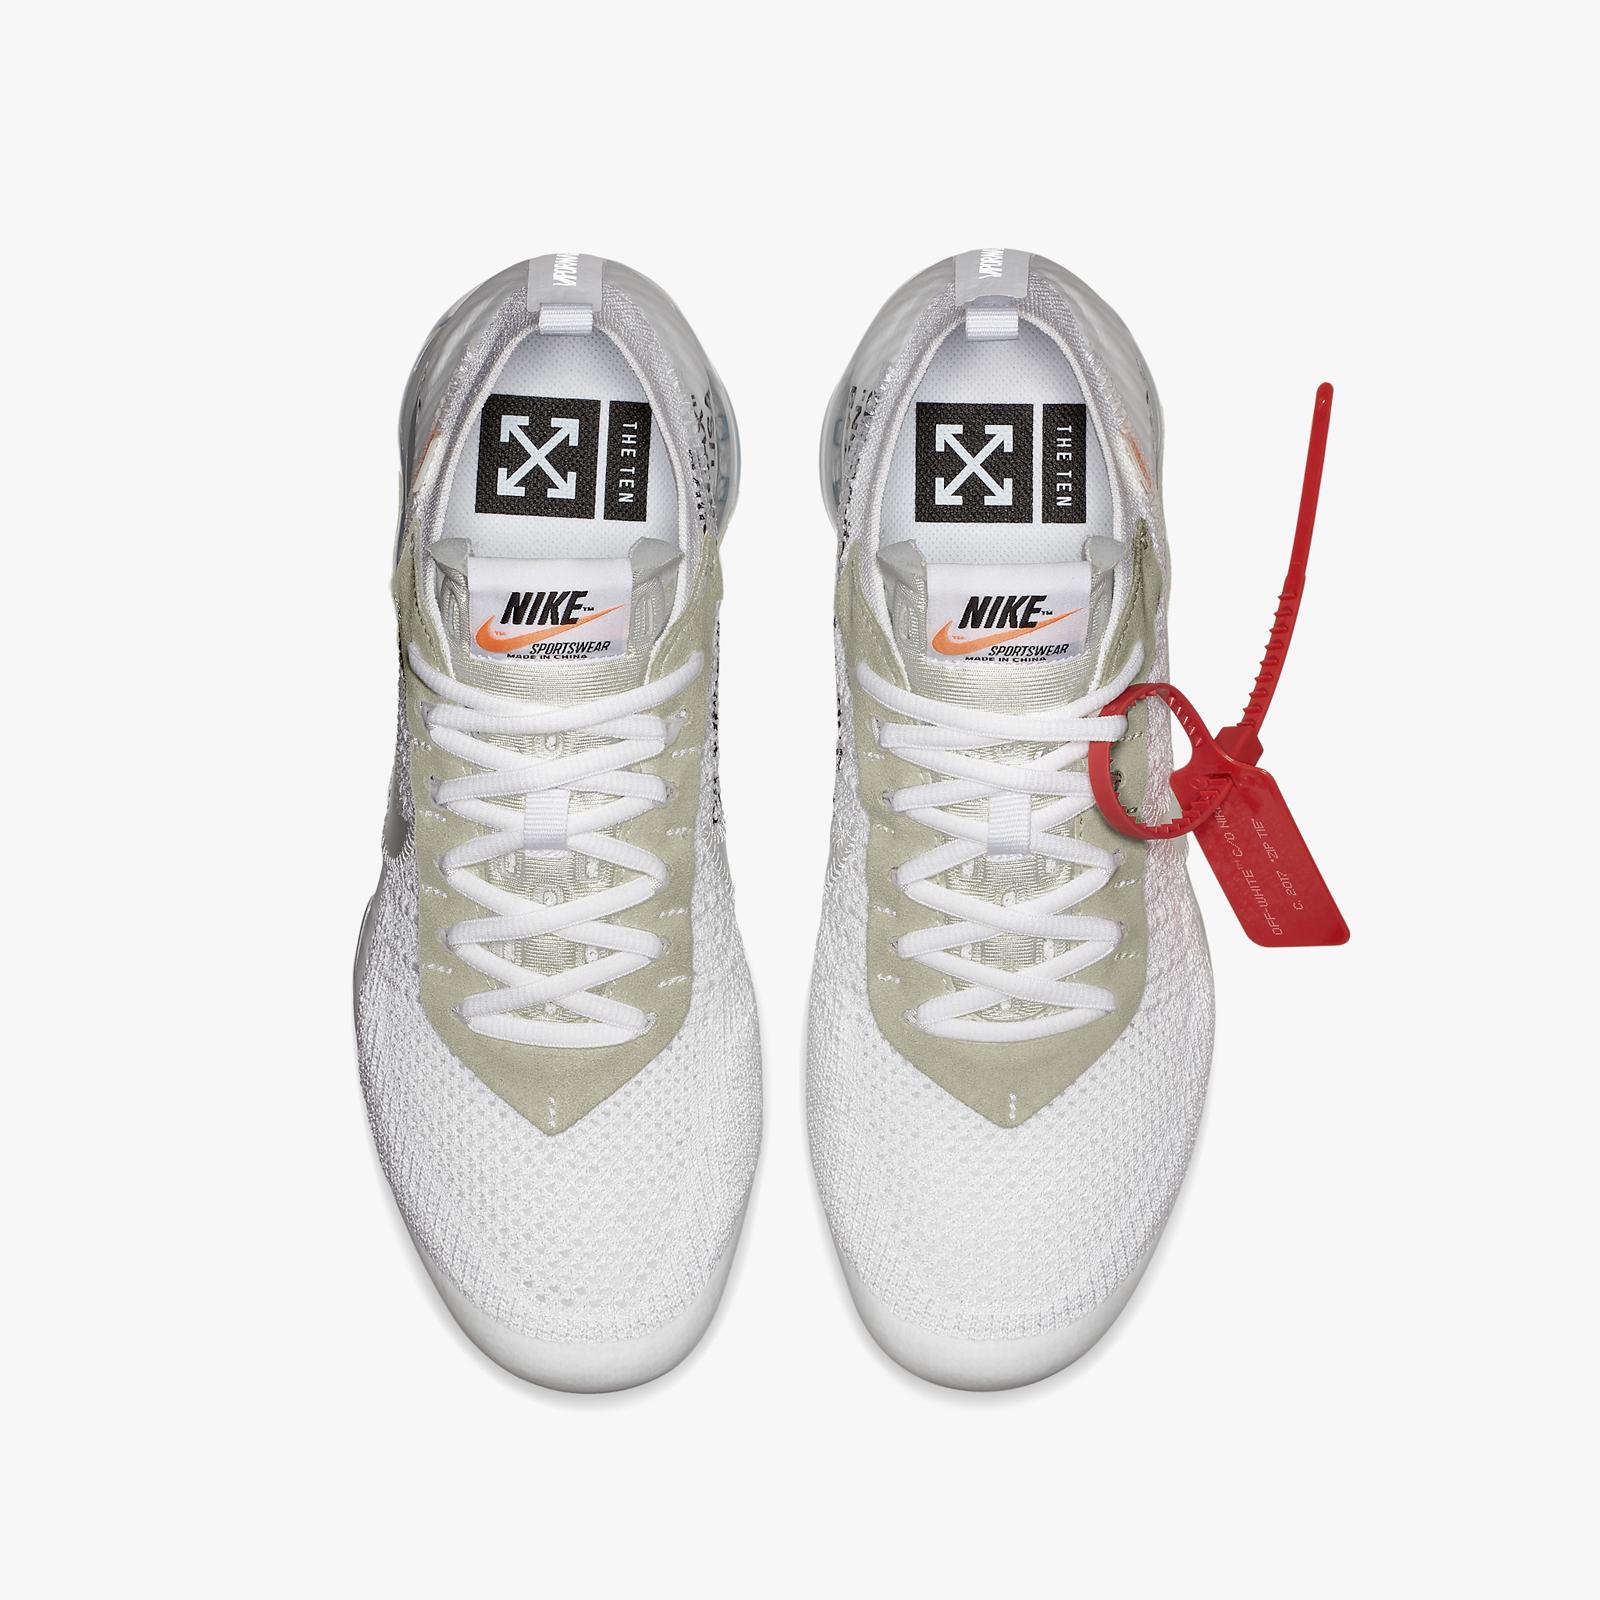 bdde87fb80b3f Nike The 10  Air Vapormax FK - Aa3831-100 - Sneakersnstuff ...